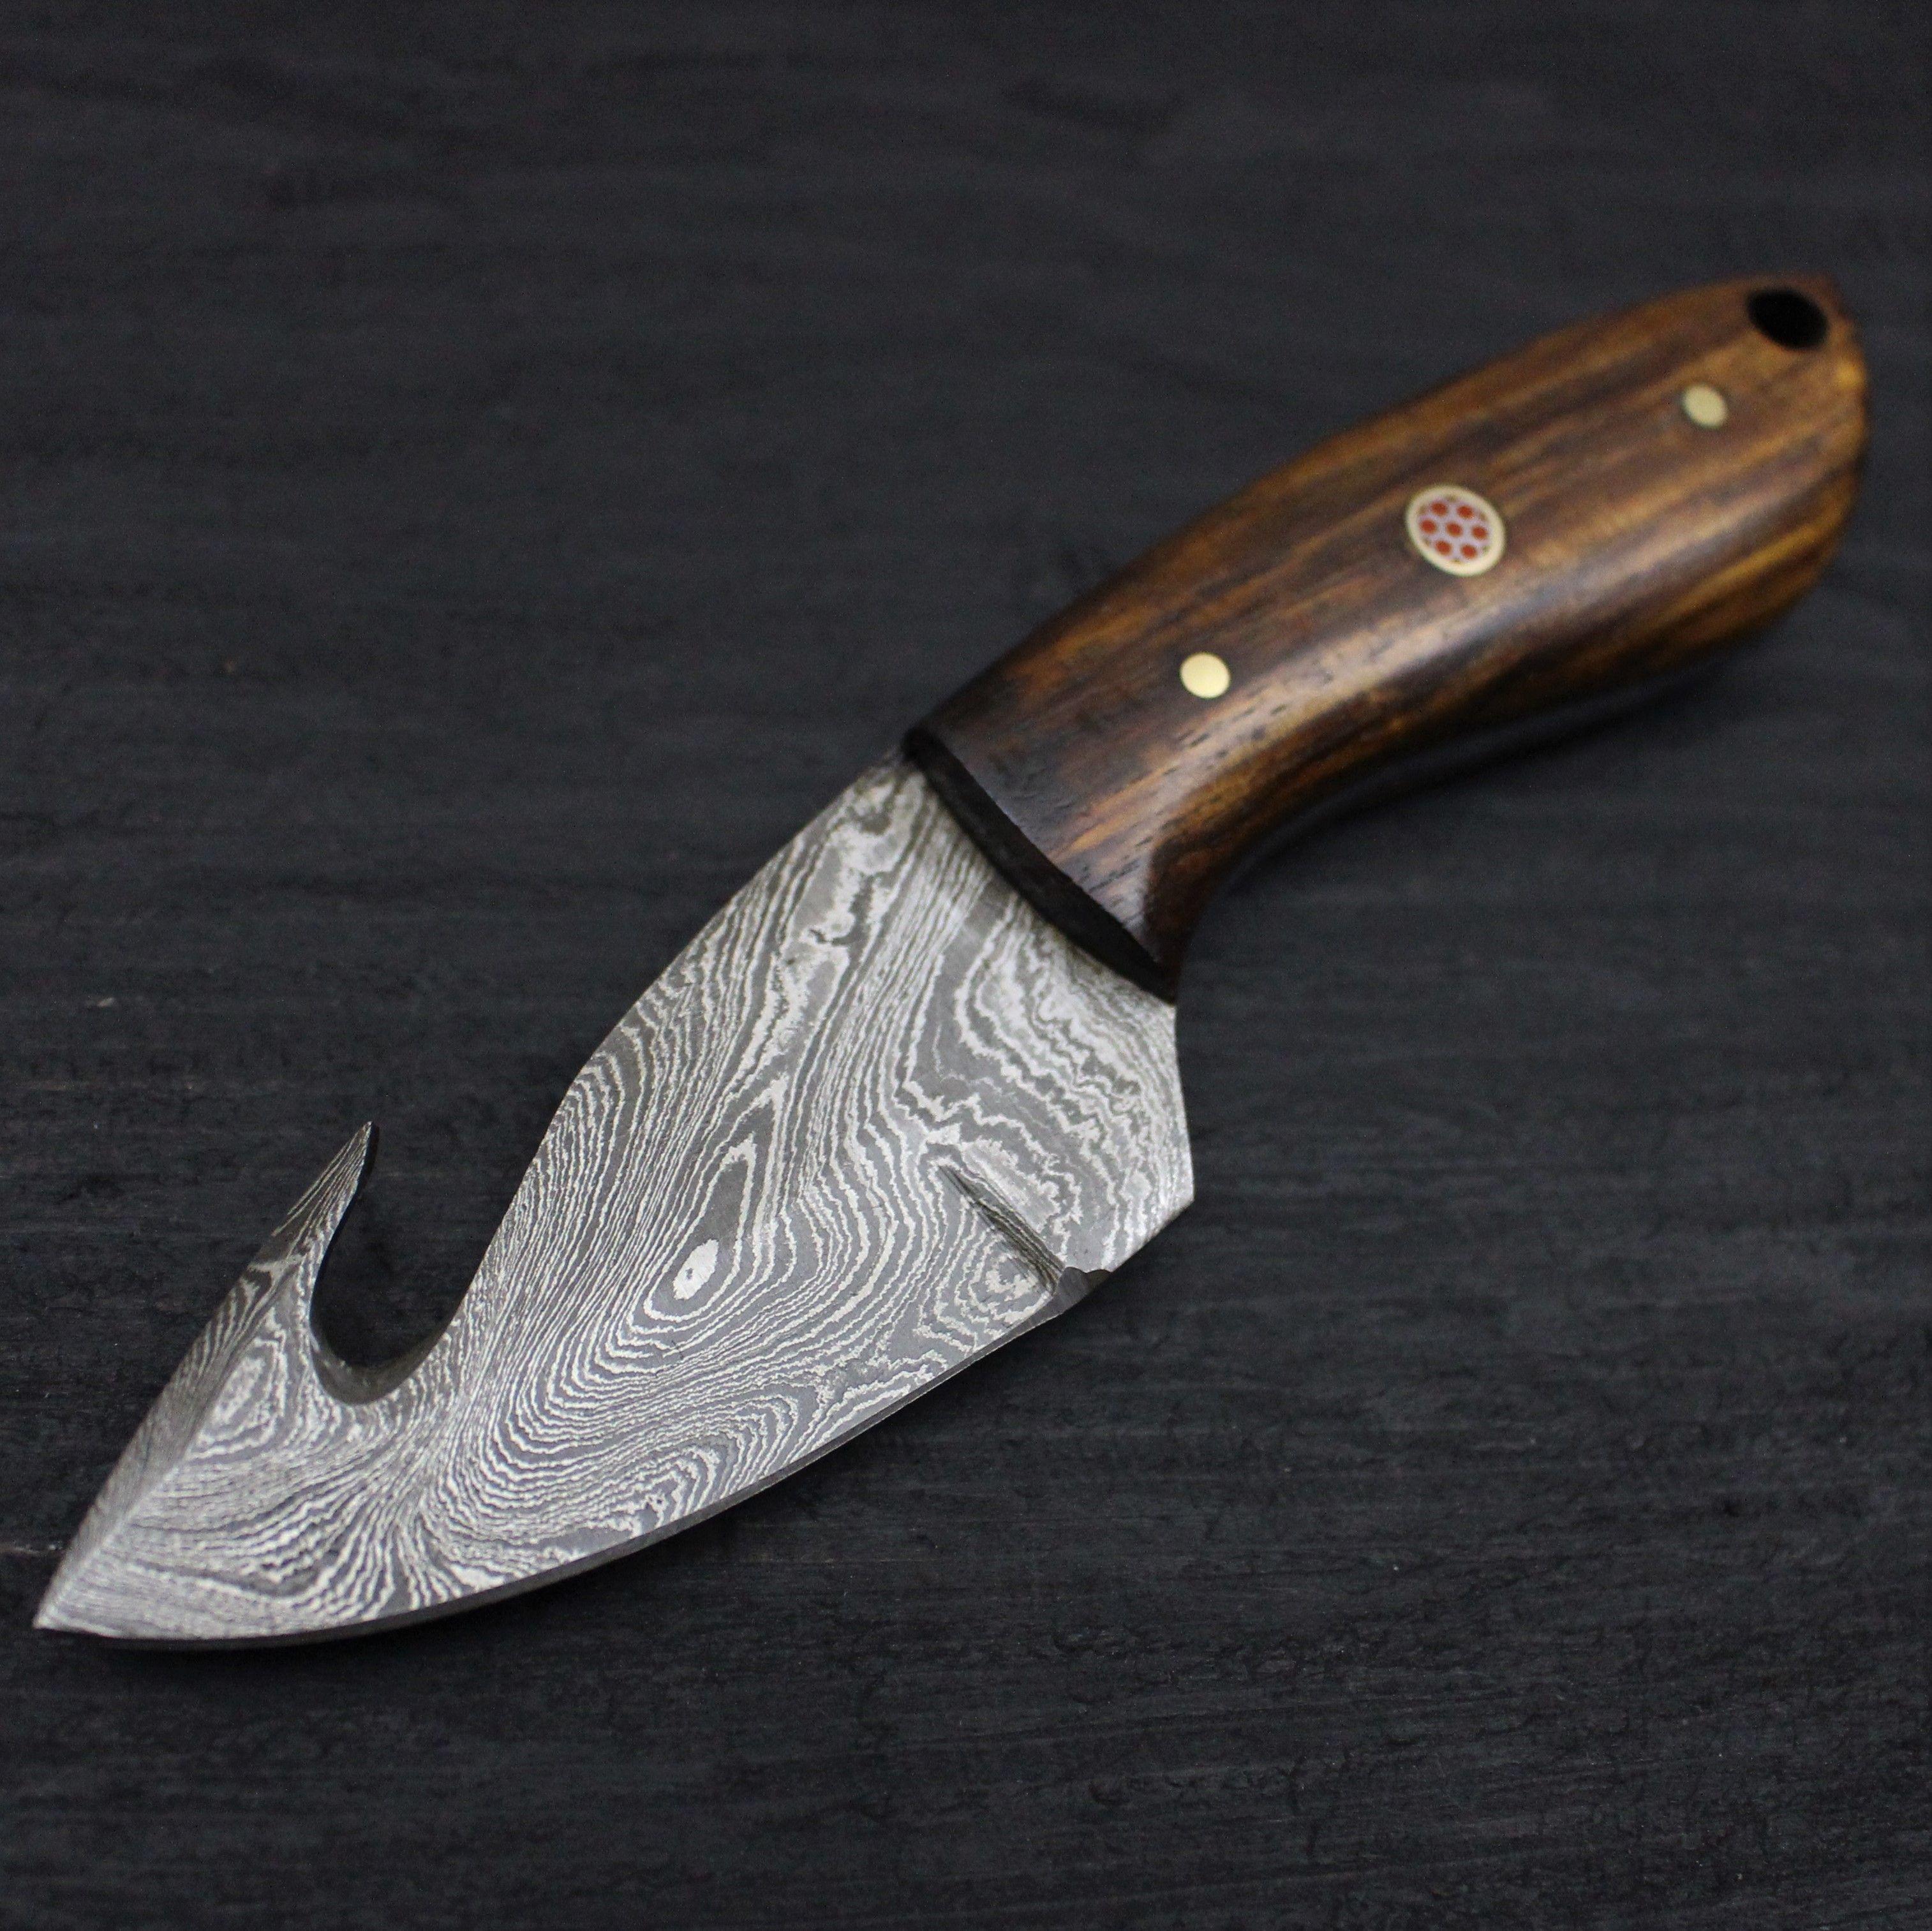 Gut Hook No 2 Damascus Steel 6 Skinning Knife Damascus Steel Skinning Knife Leather Sheath